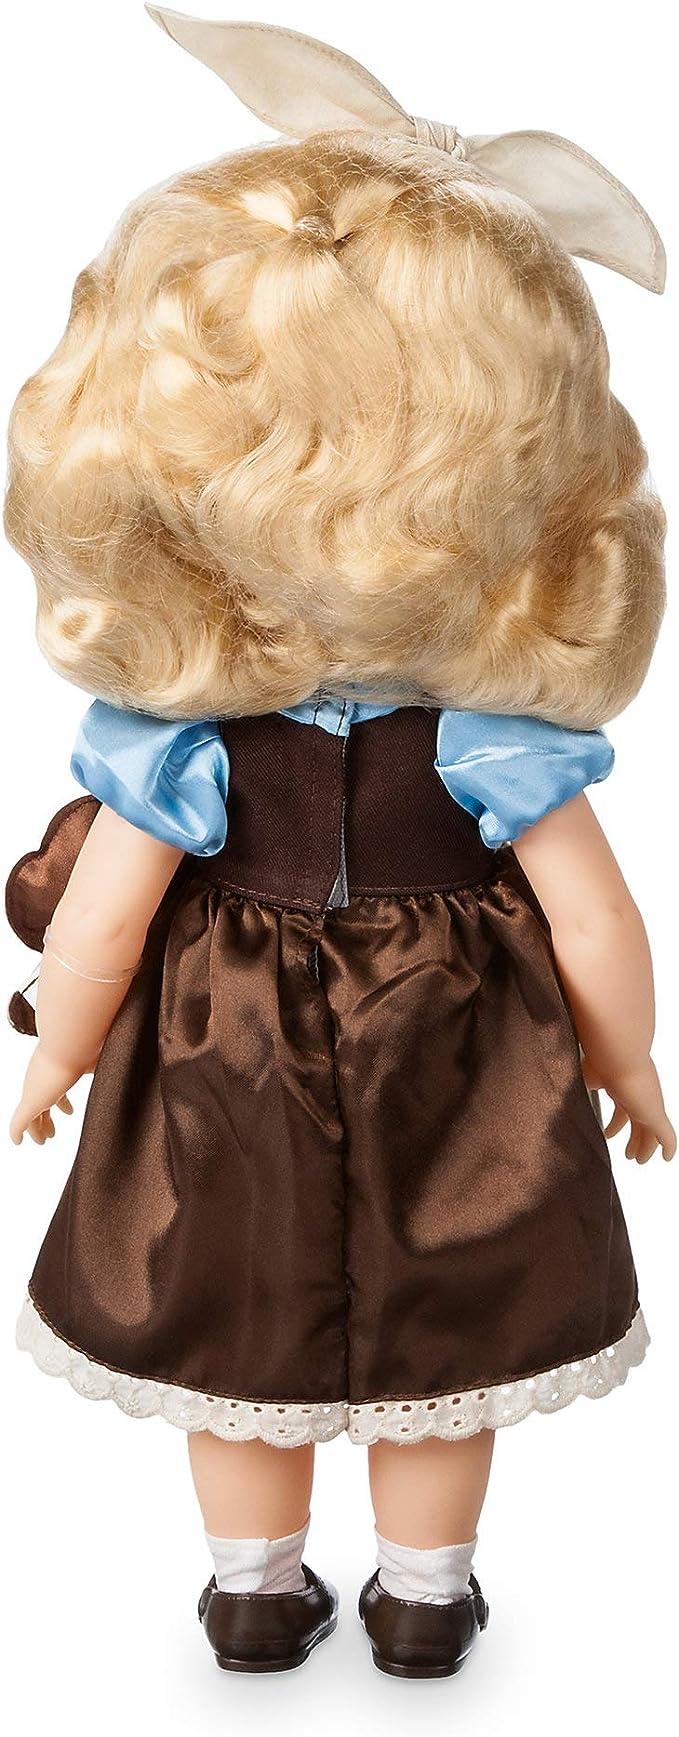 Disney Animators/' Collection Cinderella Doll 16 Inch Toy NEW